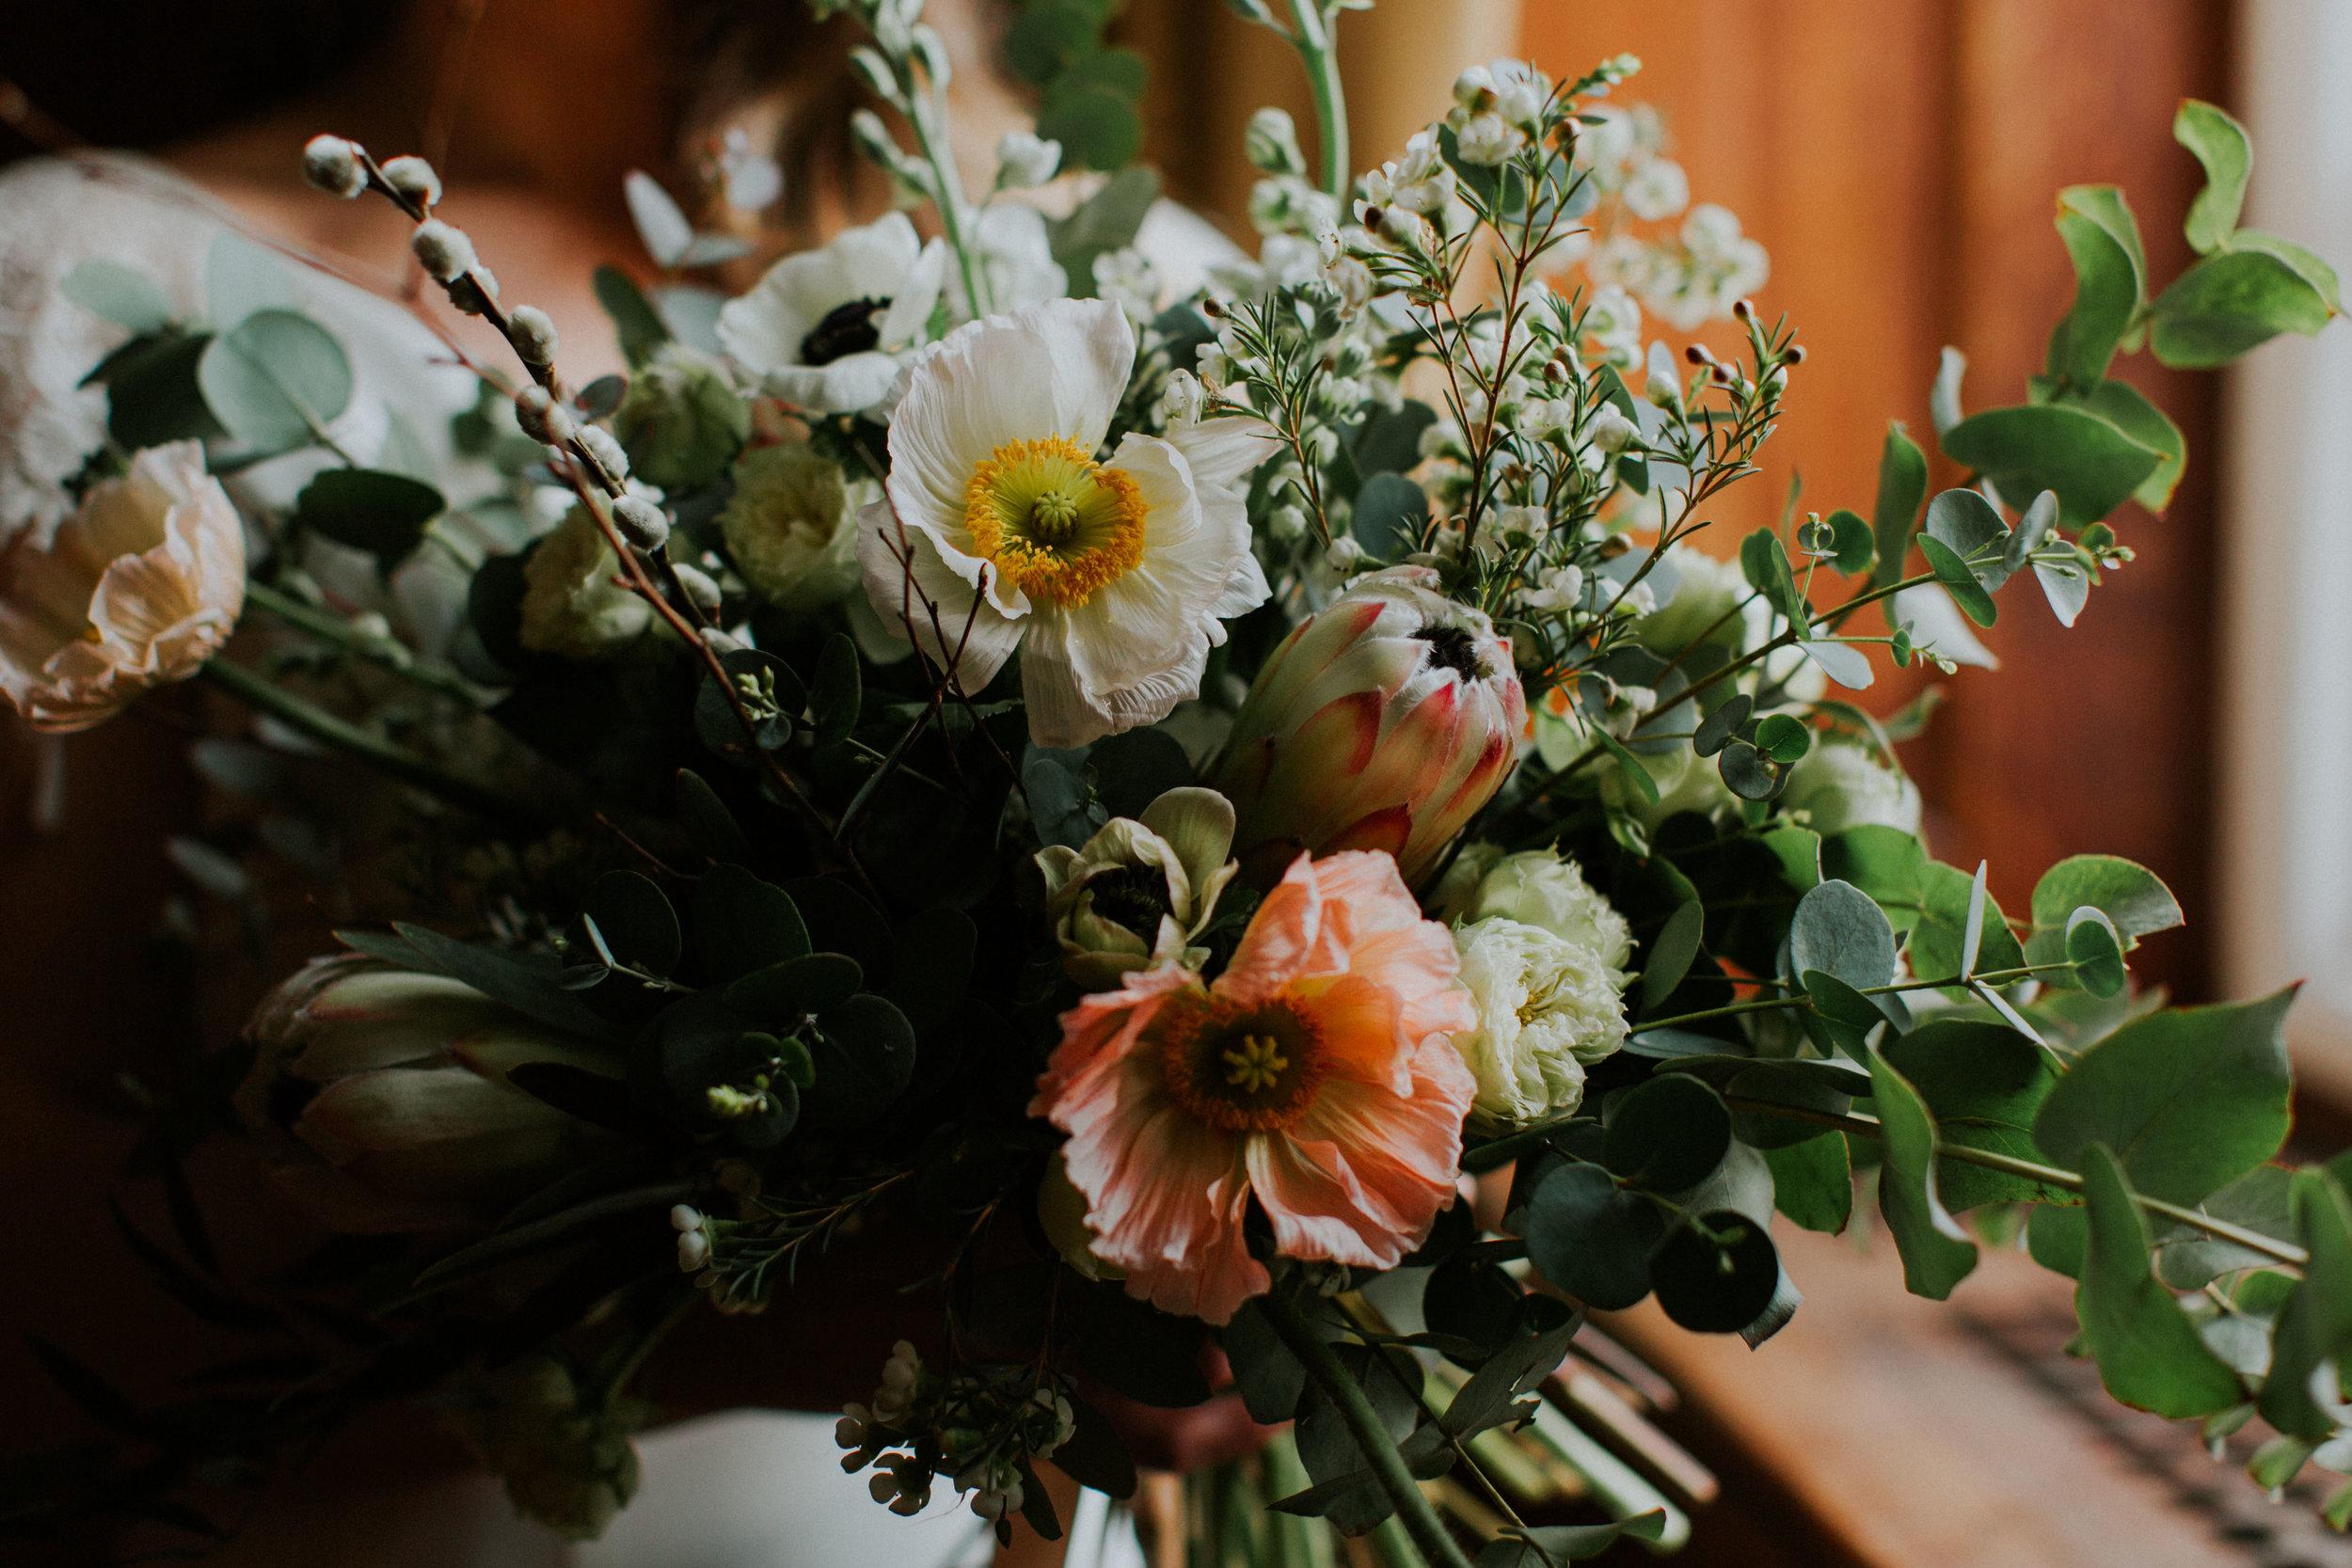 Hannah Elizabeth florist in Manchester